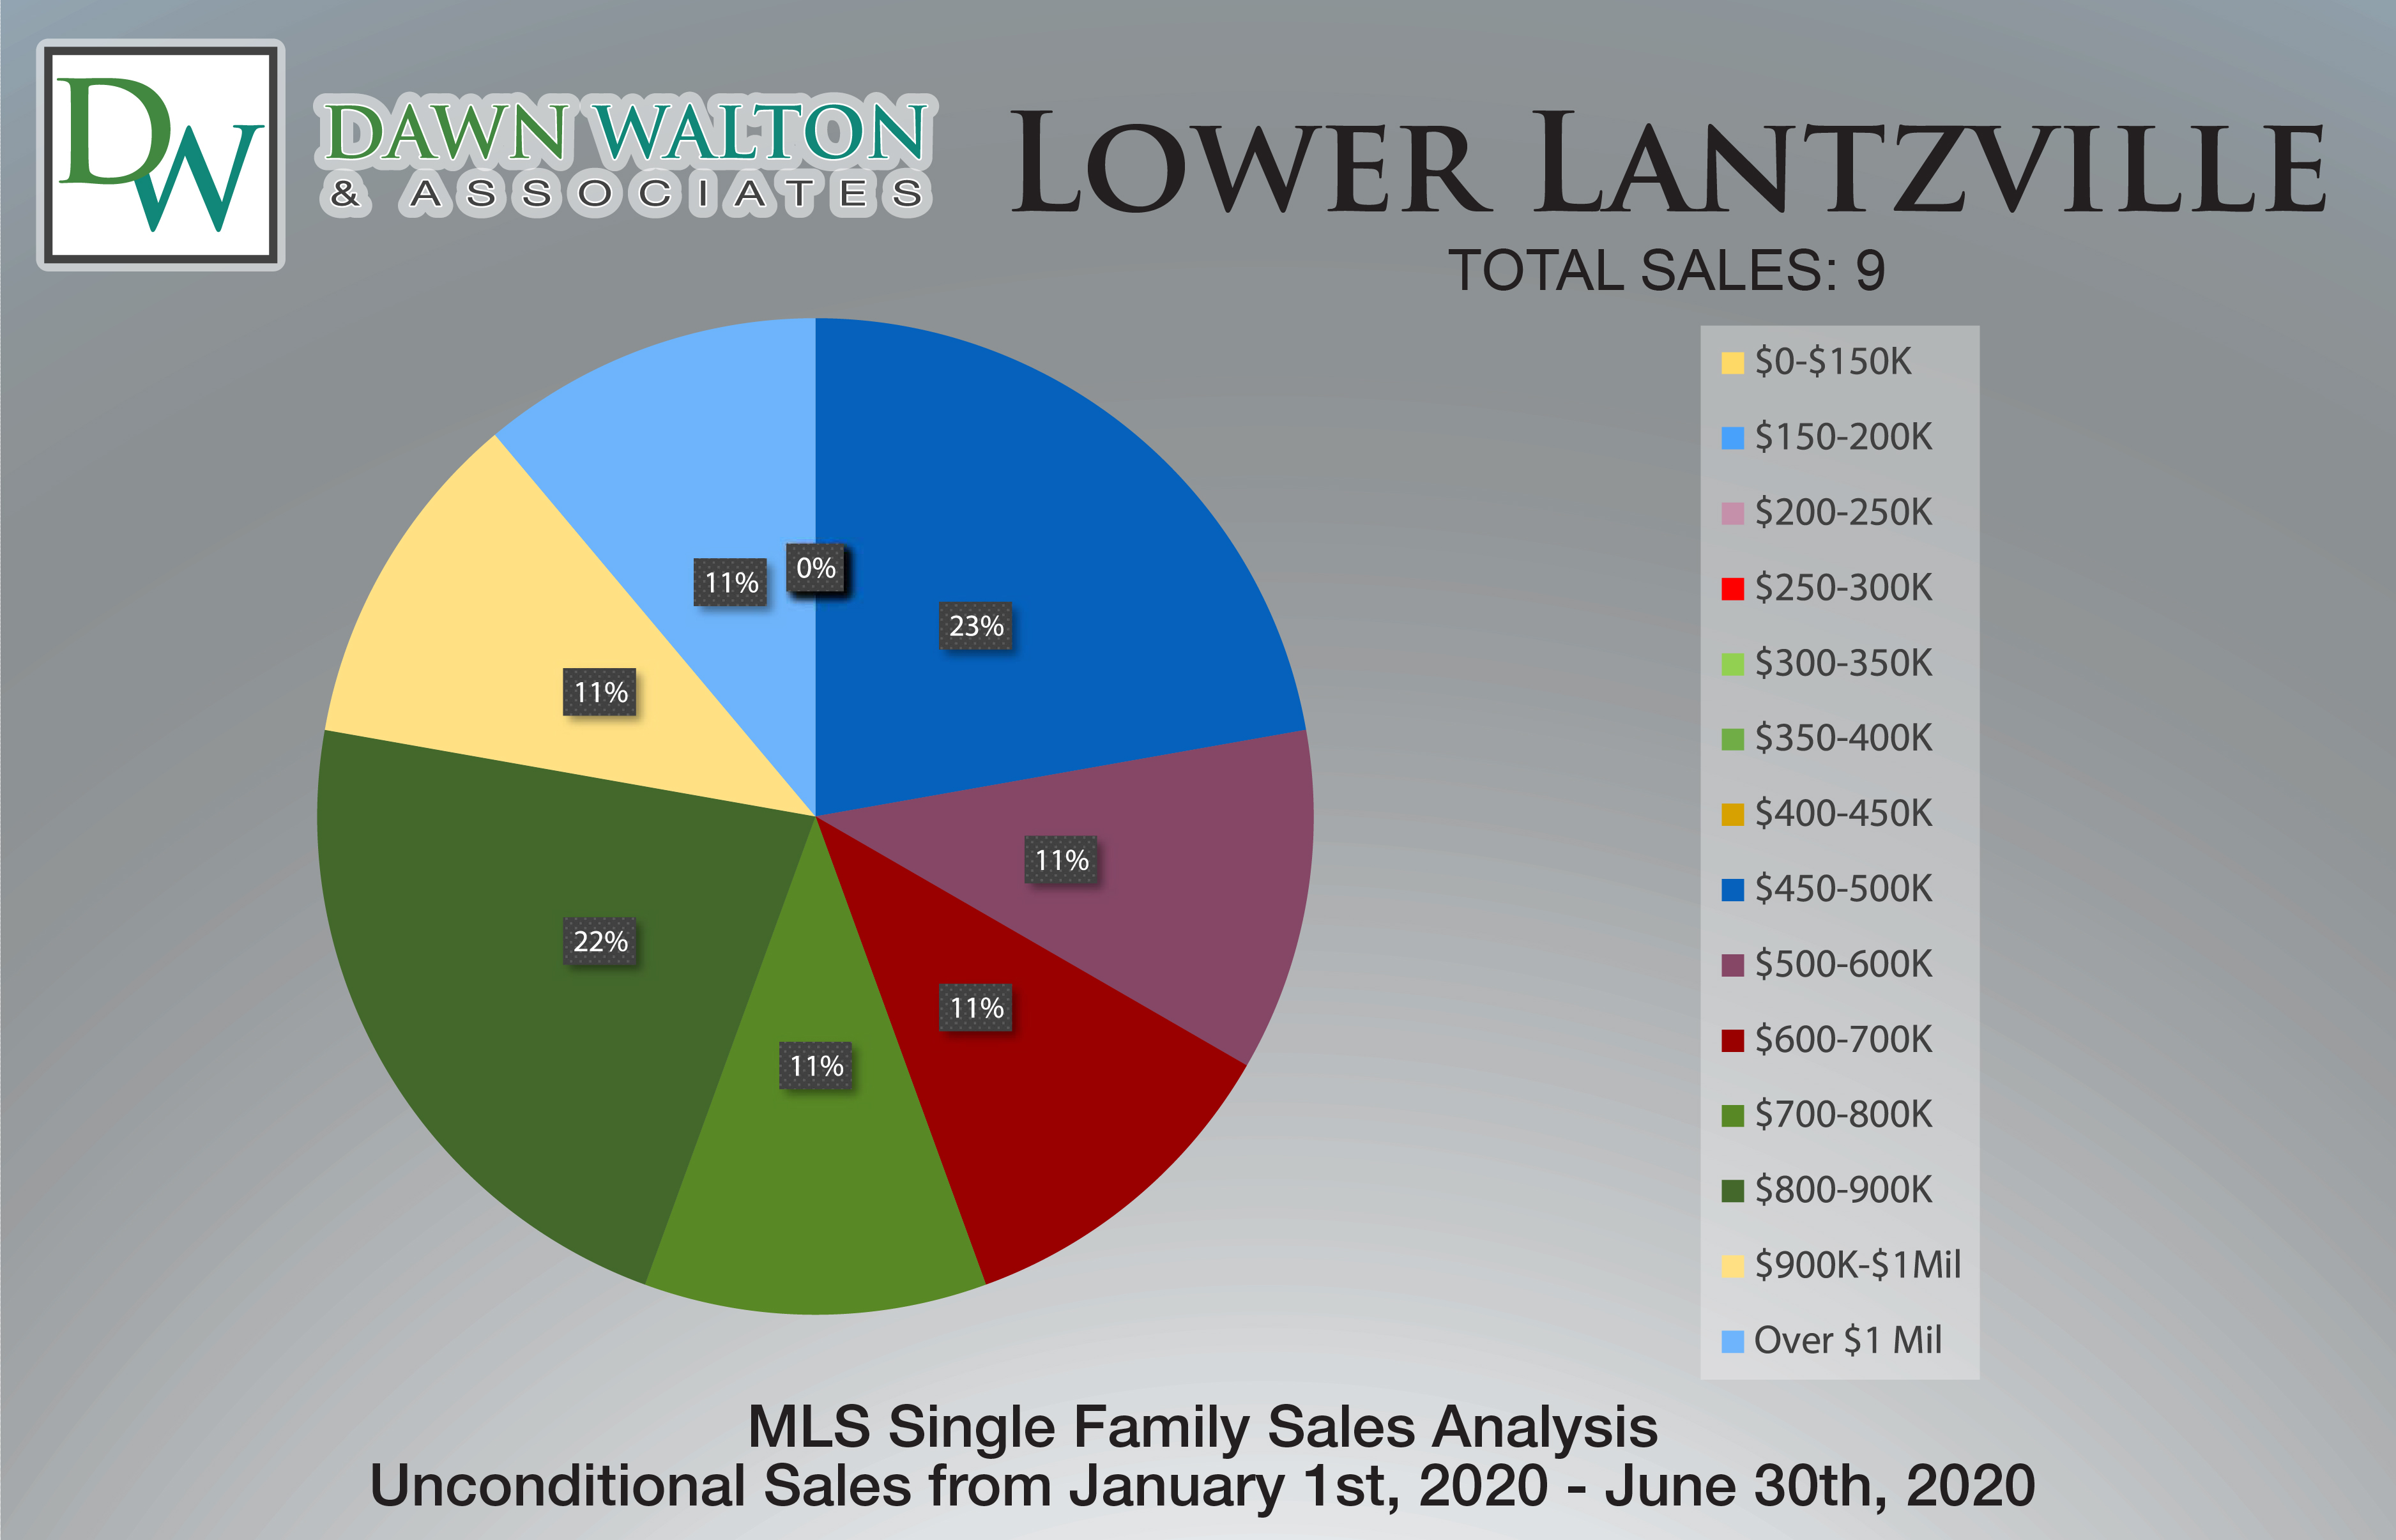 Lower Lantzville Real Estate Market Stats Price Percentage Jan 1- June 30th  2020 - Nanaimo Realtor Dawn Walton